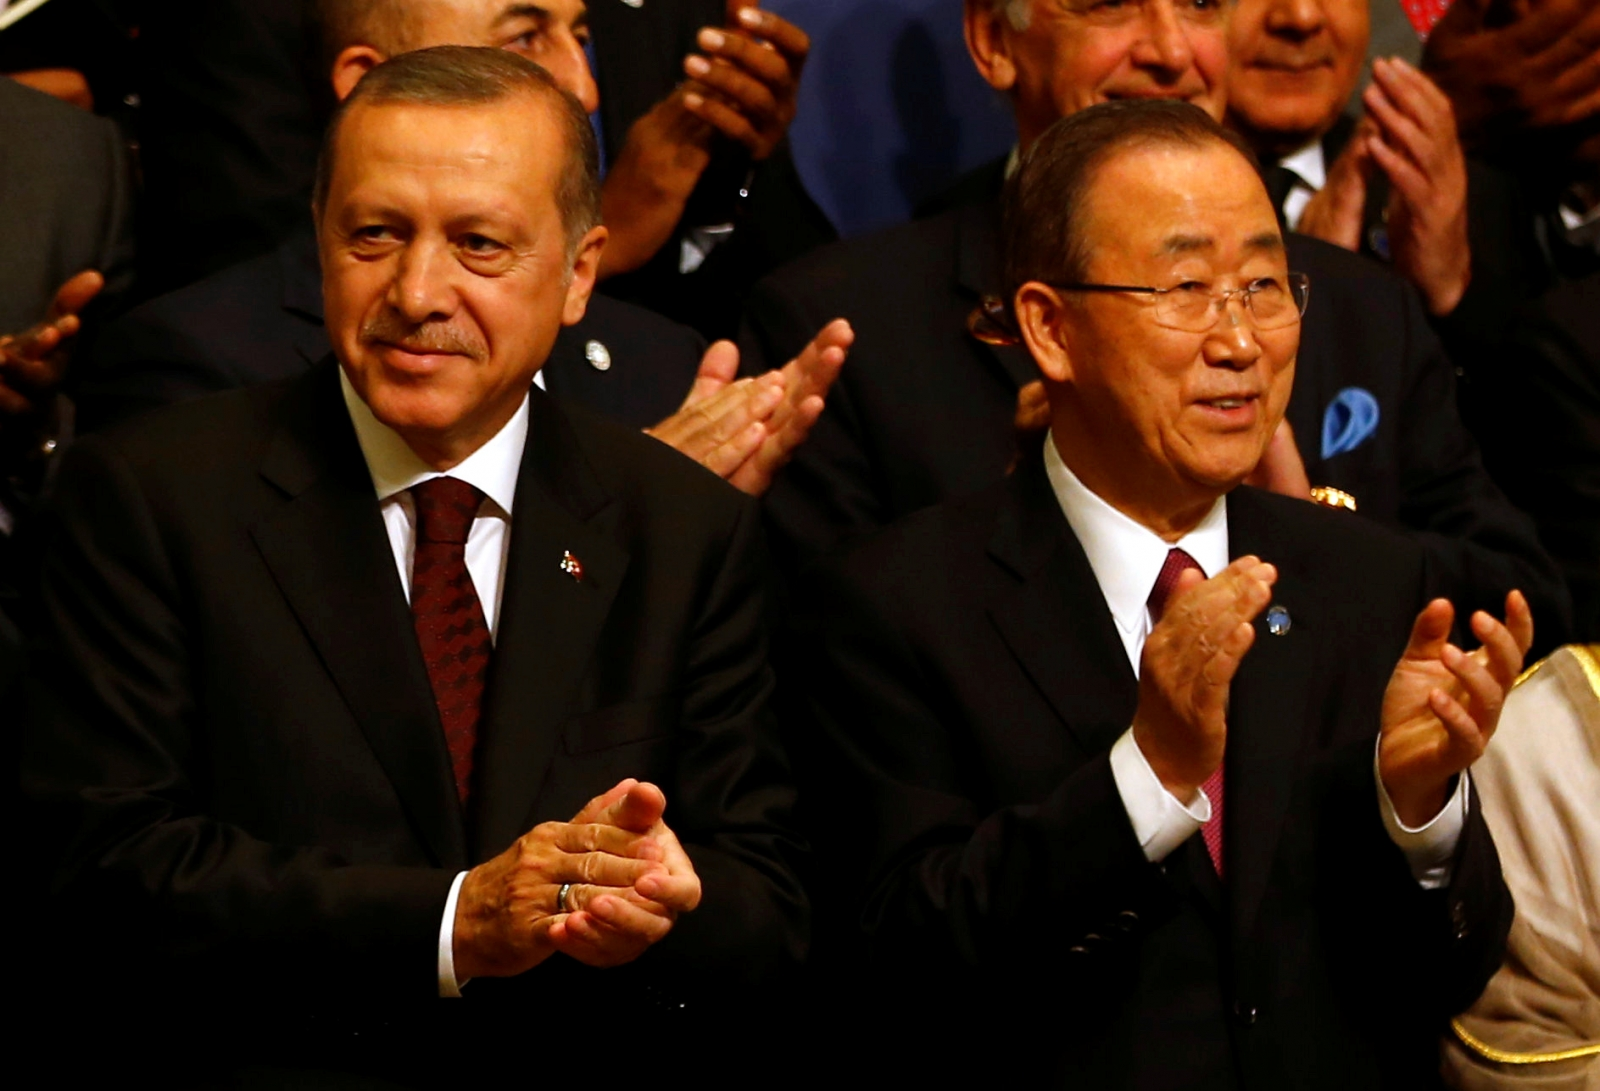 Turkish President Tayyip Erdogan and U.N. Secretary-General Ban Ki-moon